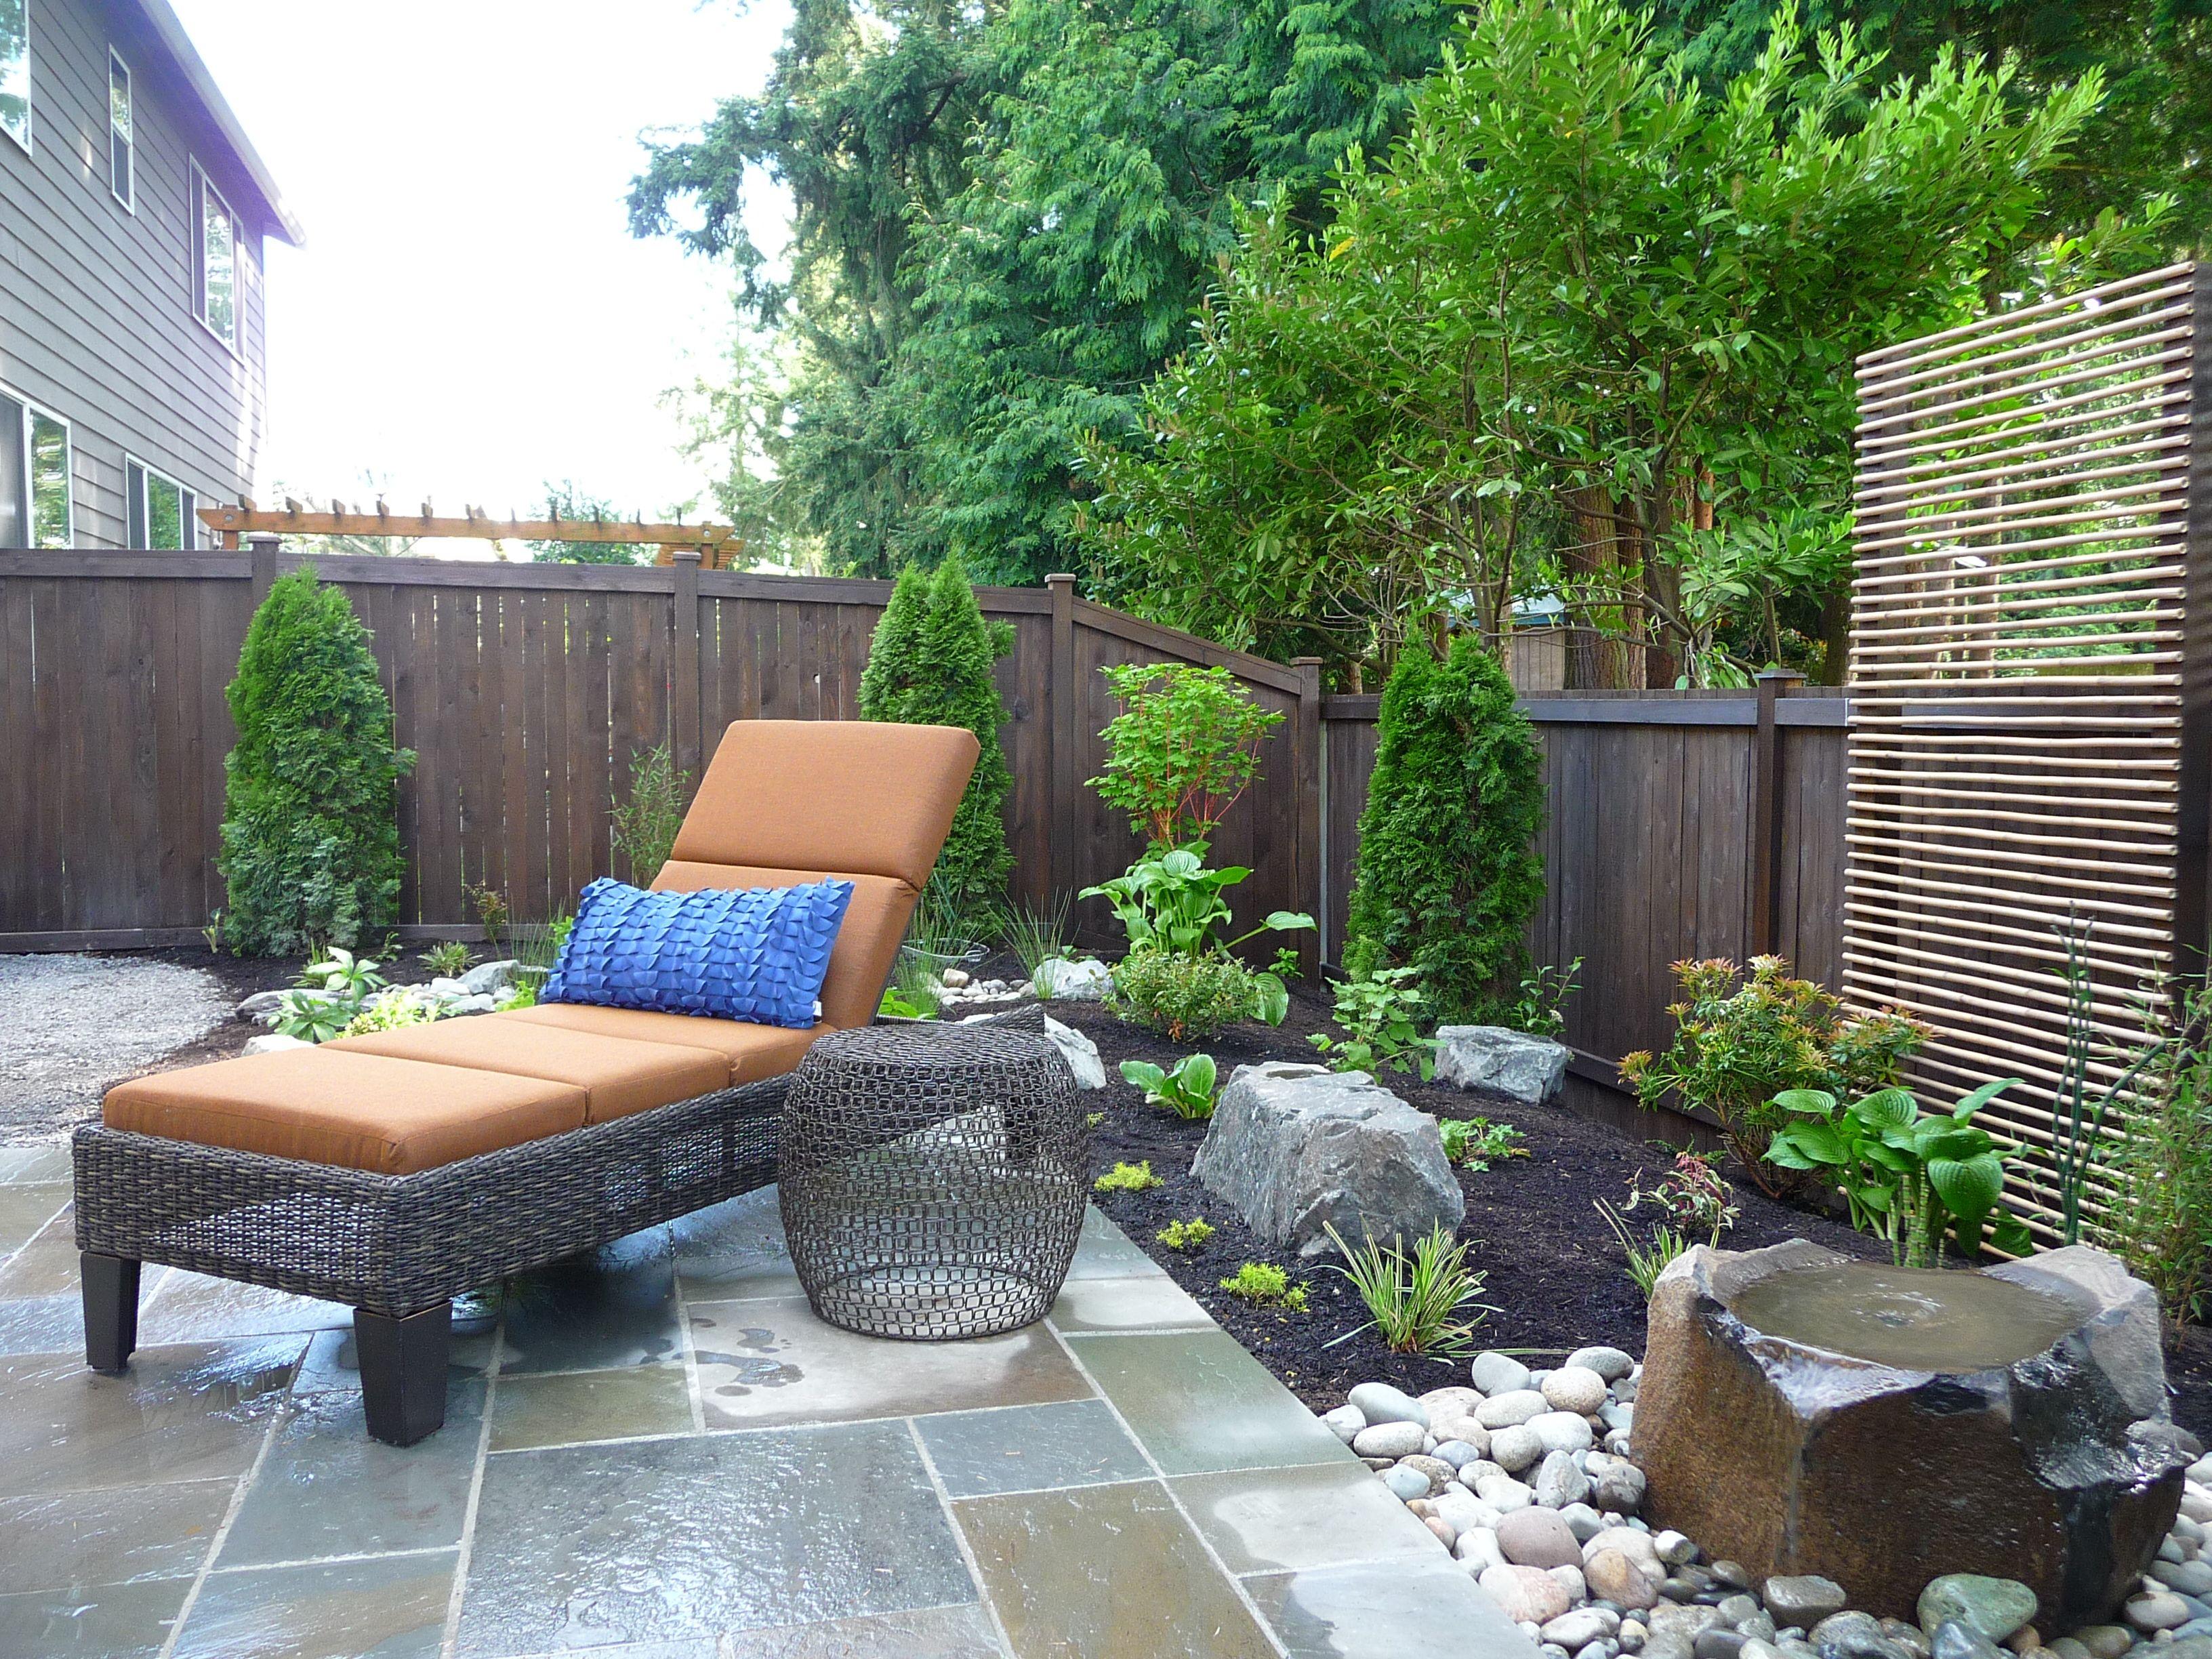 Zen backyard  Small backyard, Backyard patio designs, Backyard